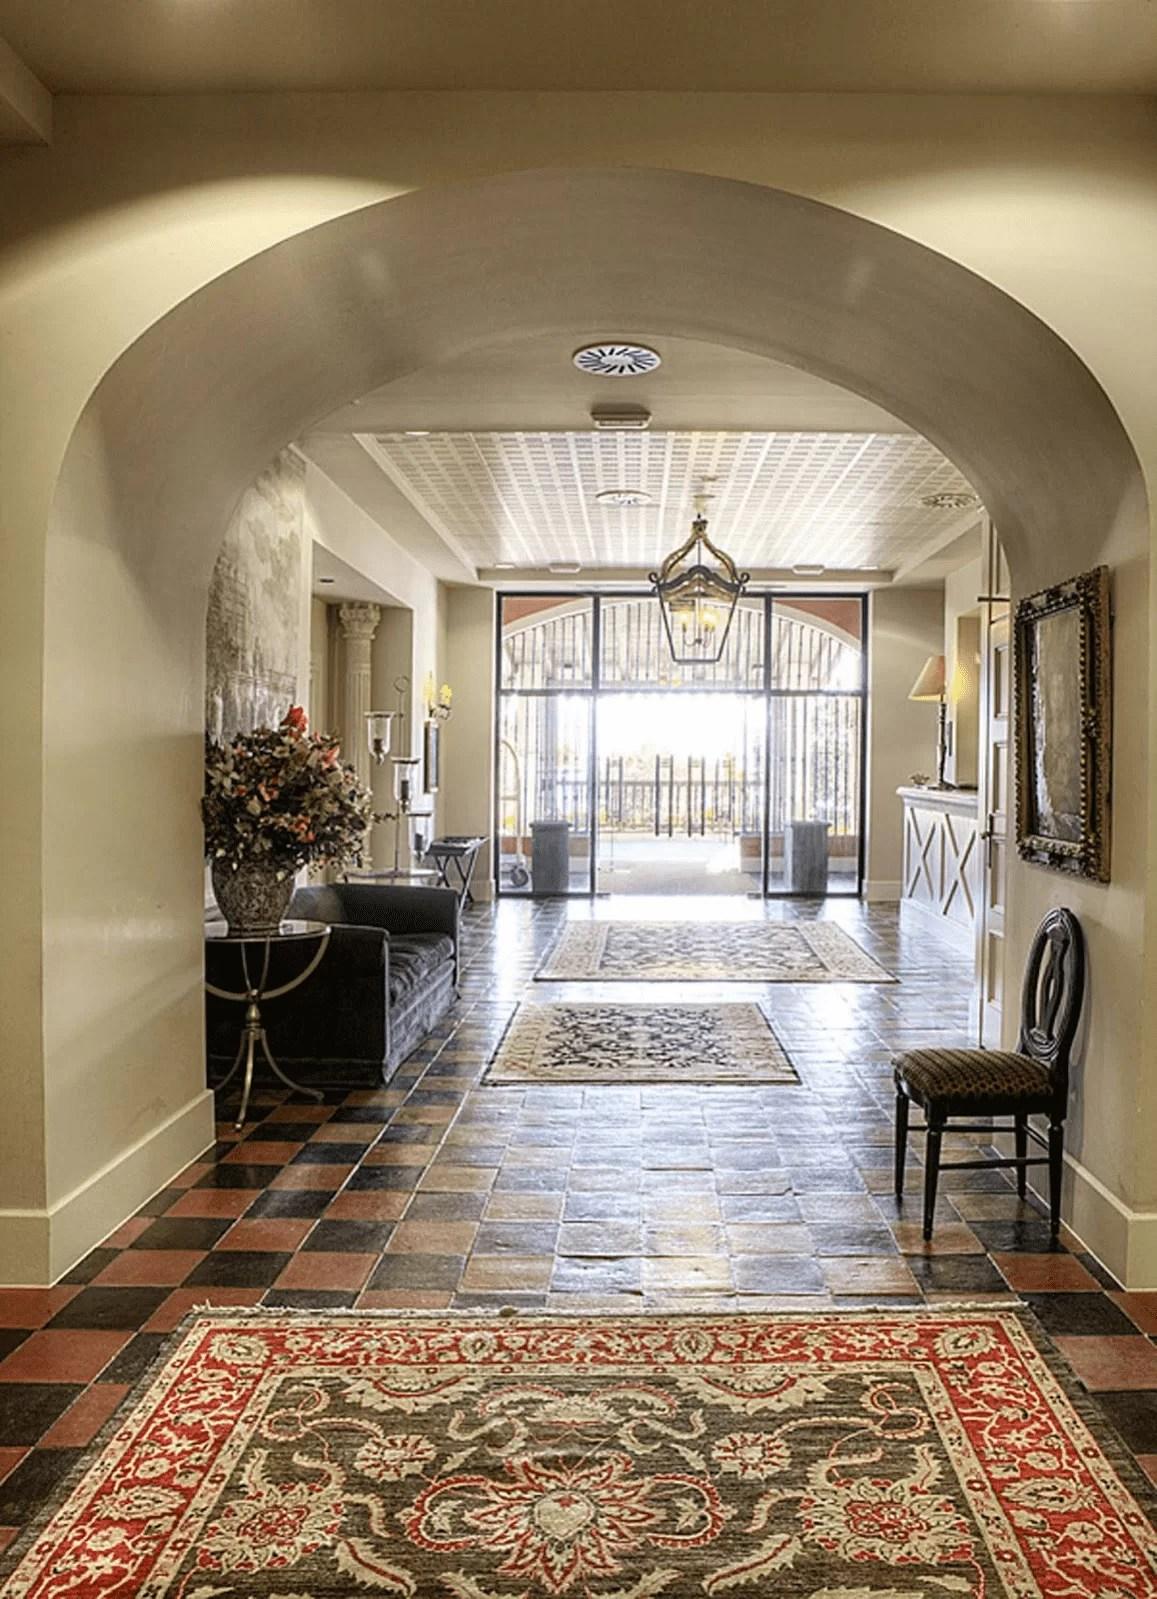 Xarma, alojamientos con encanto - Hotel Palacio Urgoiti